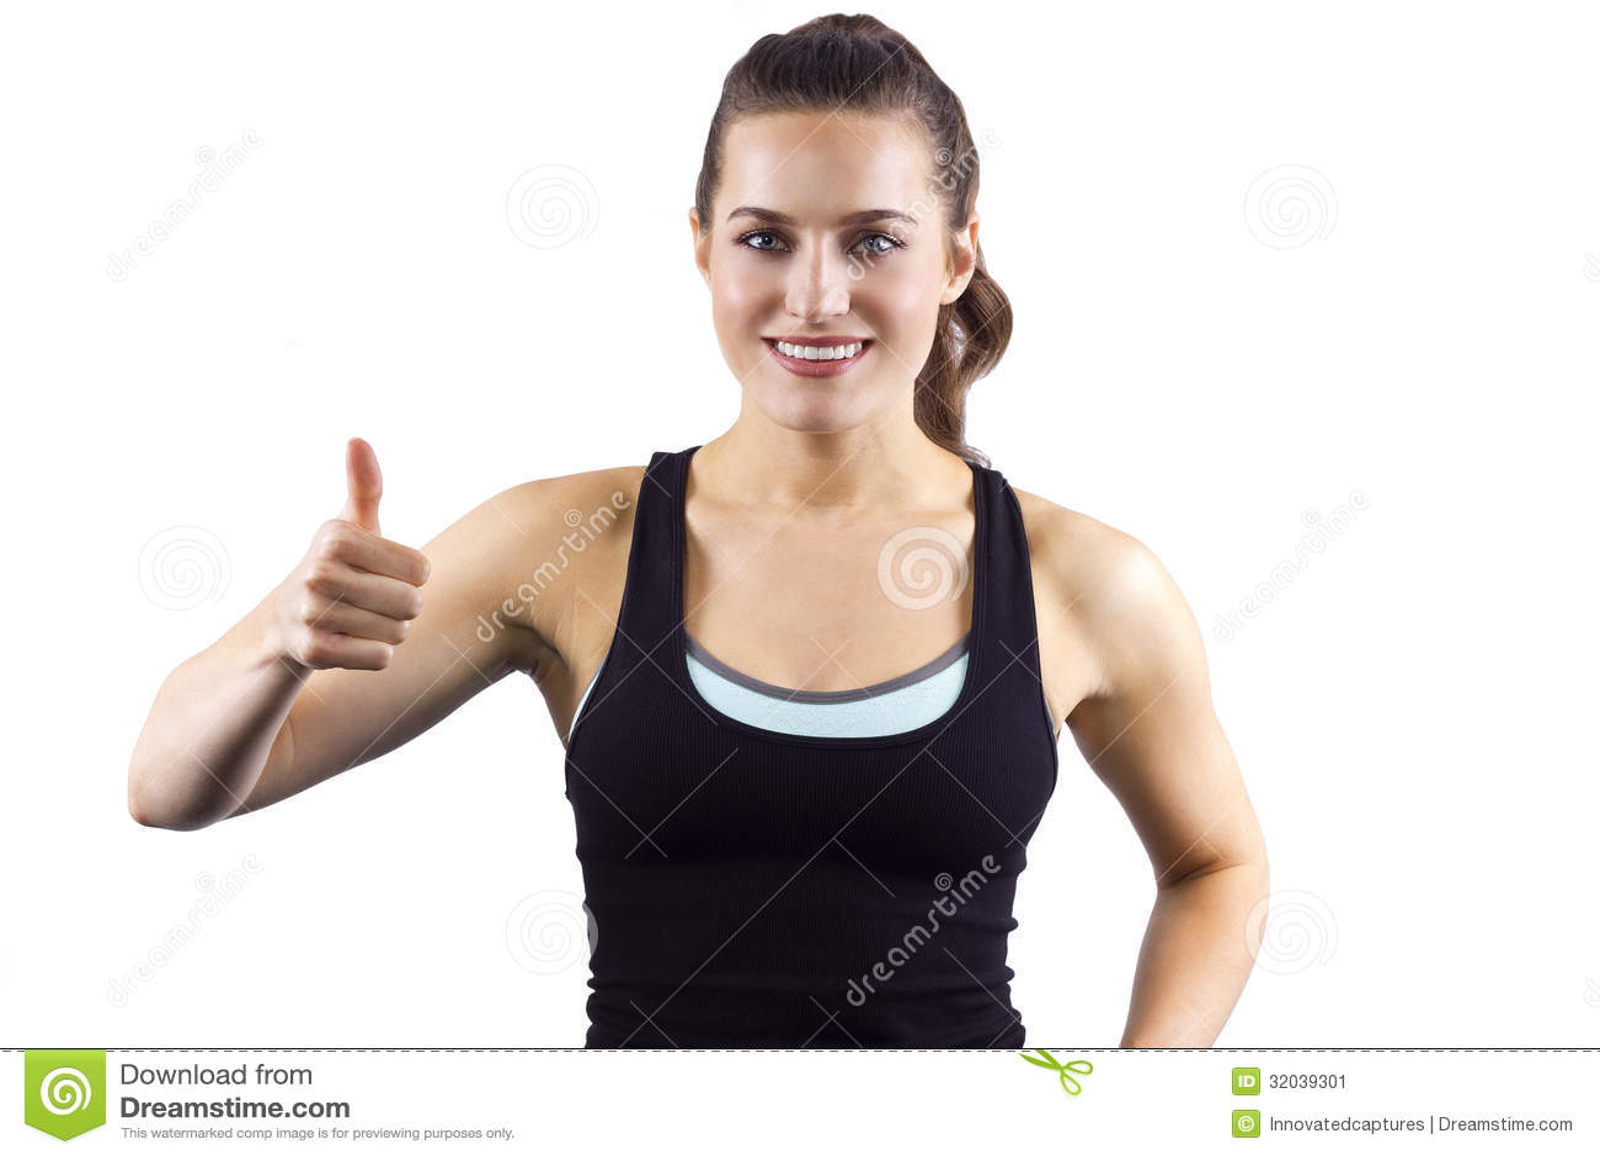 Upvote stock image. Image of health, female, athlete ...